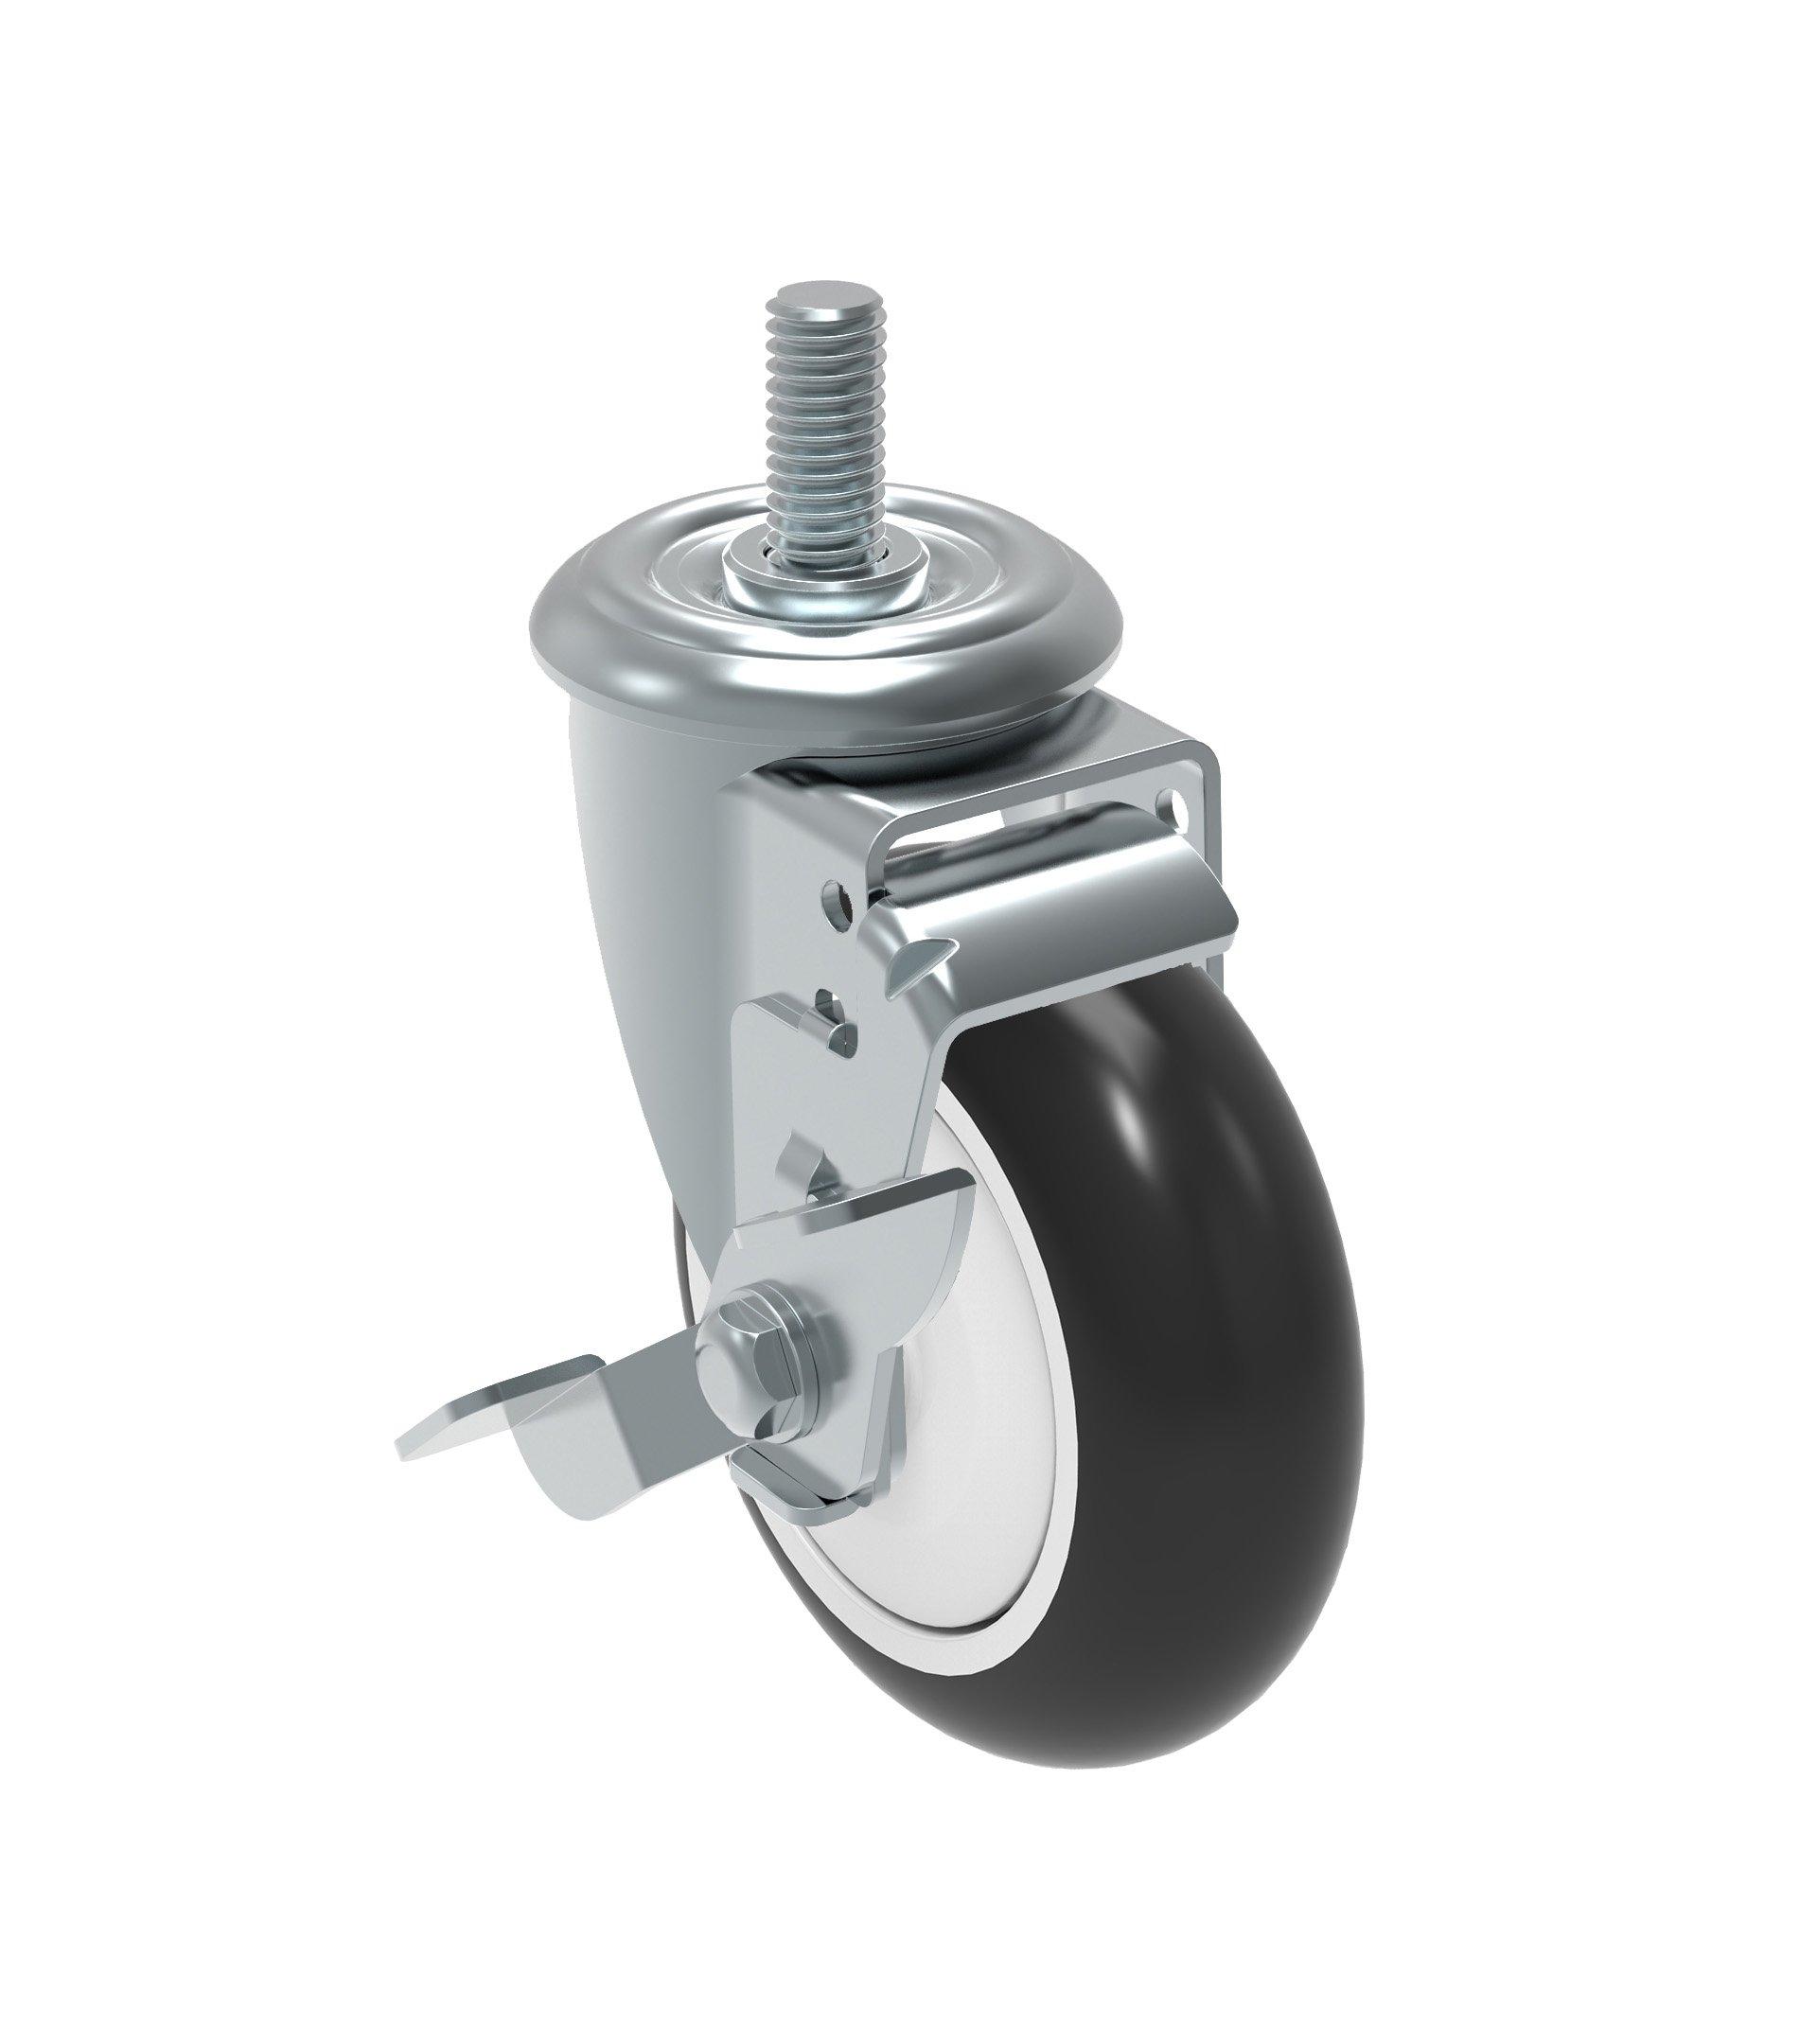 Schioppa GLEIF 412 NPE SL L12 Series 4'' x 1-1/4'' Diameter Swivel Caster with Wheel Lock Brake, Non-Marking Polypropylene Precision Ball Bearing Wheel, 1/2'' Diameter x 1-1/2'' Length Threaded Stem, 275 lb